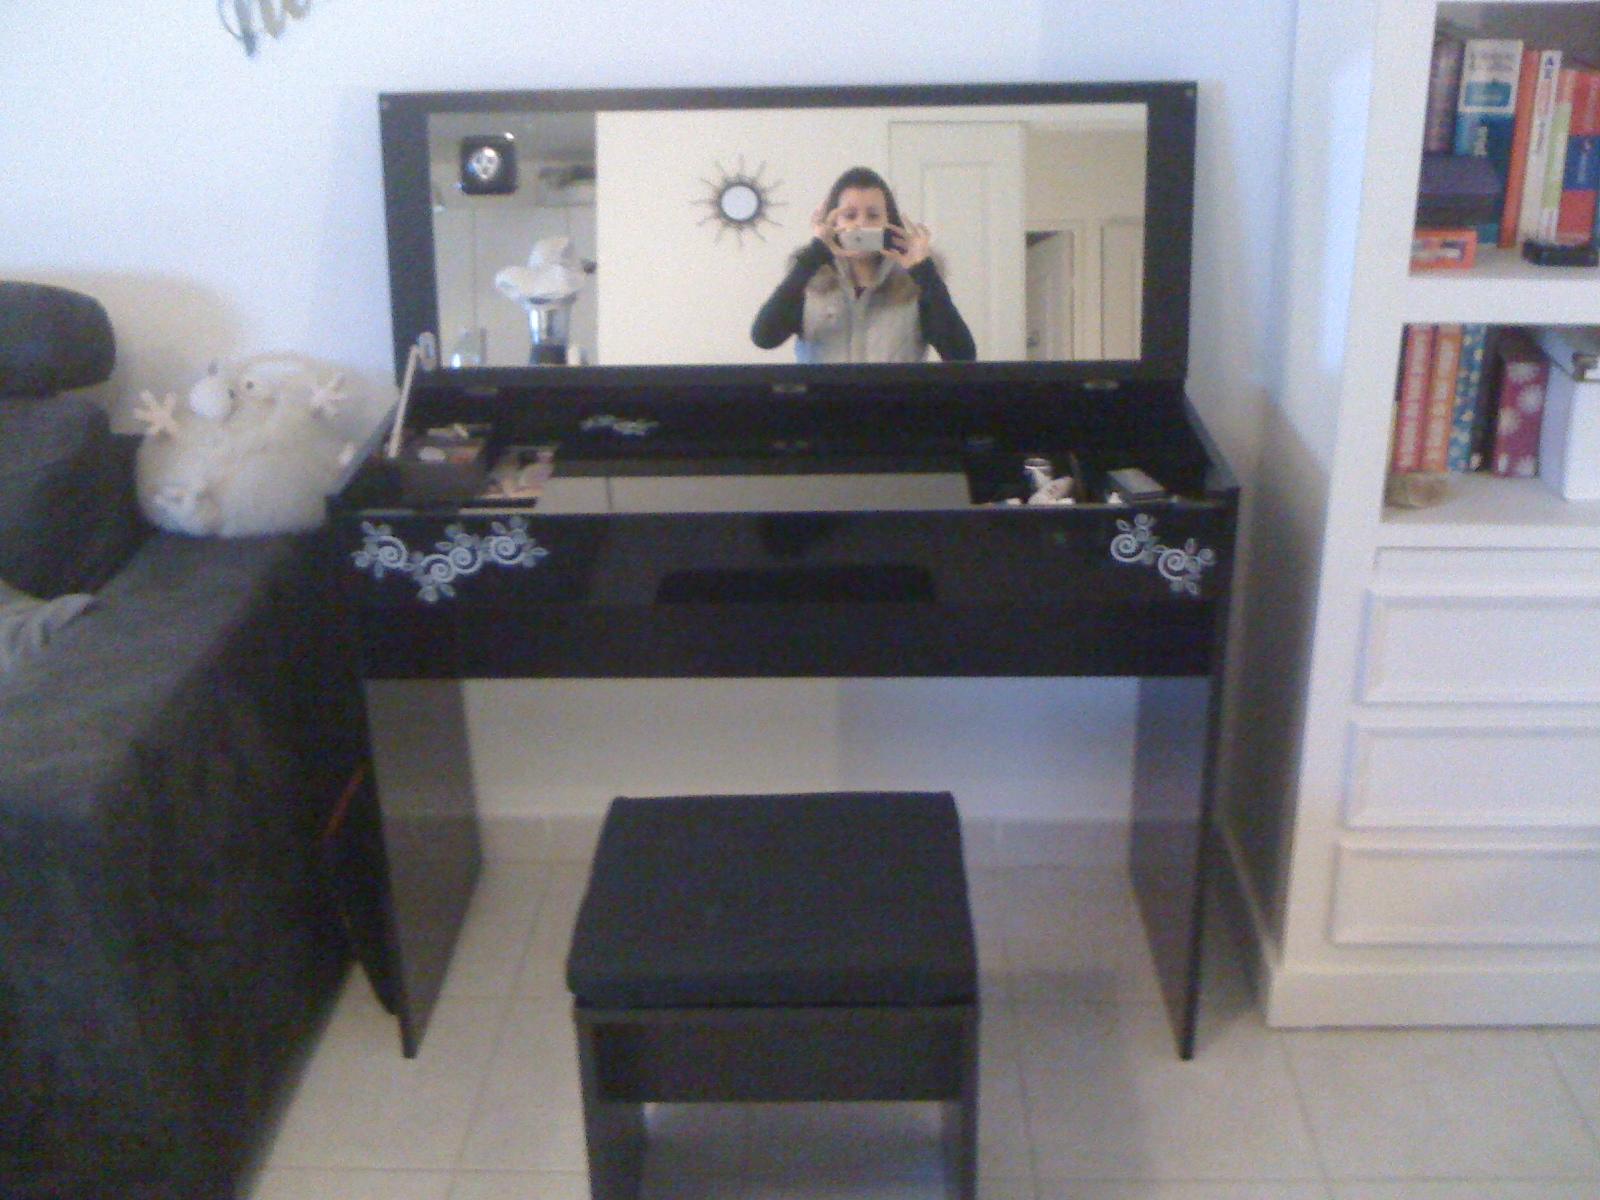 coiffeuse alinea blog okeh. Black Bedroom Furniture Sets. Home Design Ideas